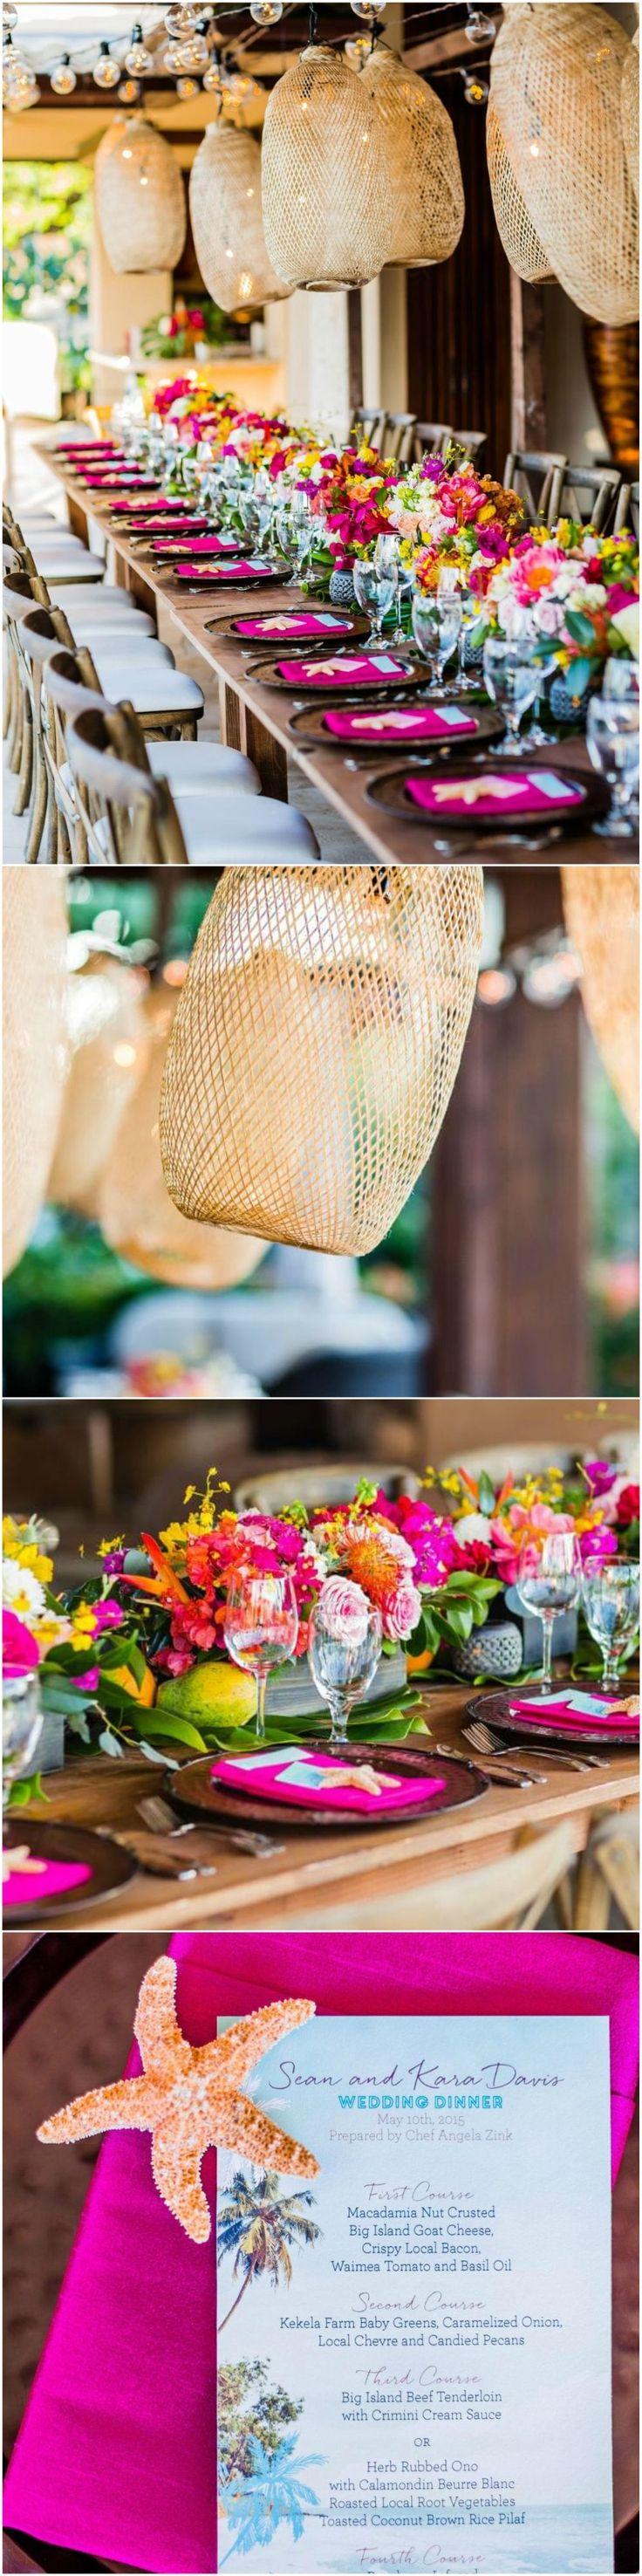 Hot pink linens, wedding reception, starfish, hanging lanterns, Hawaii table décor, event design, tropical flowers // Damion Hamilton Photographer